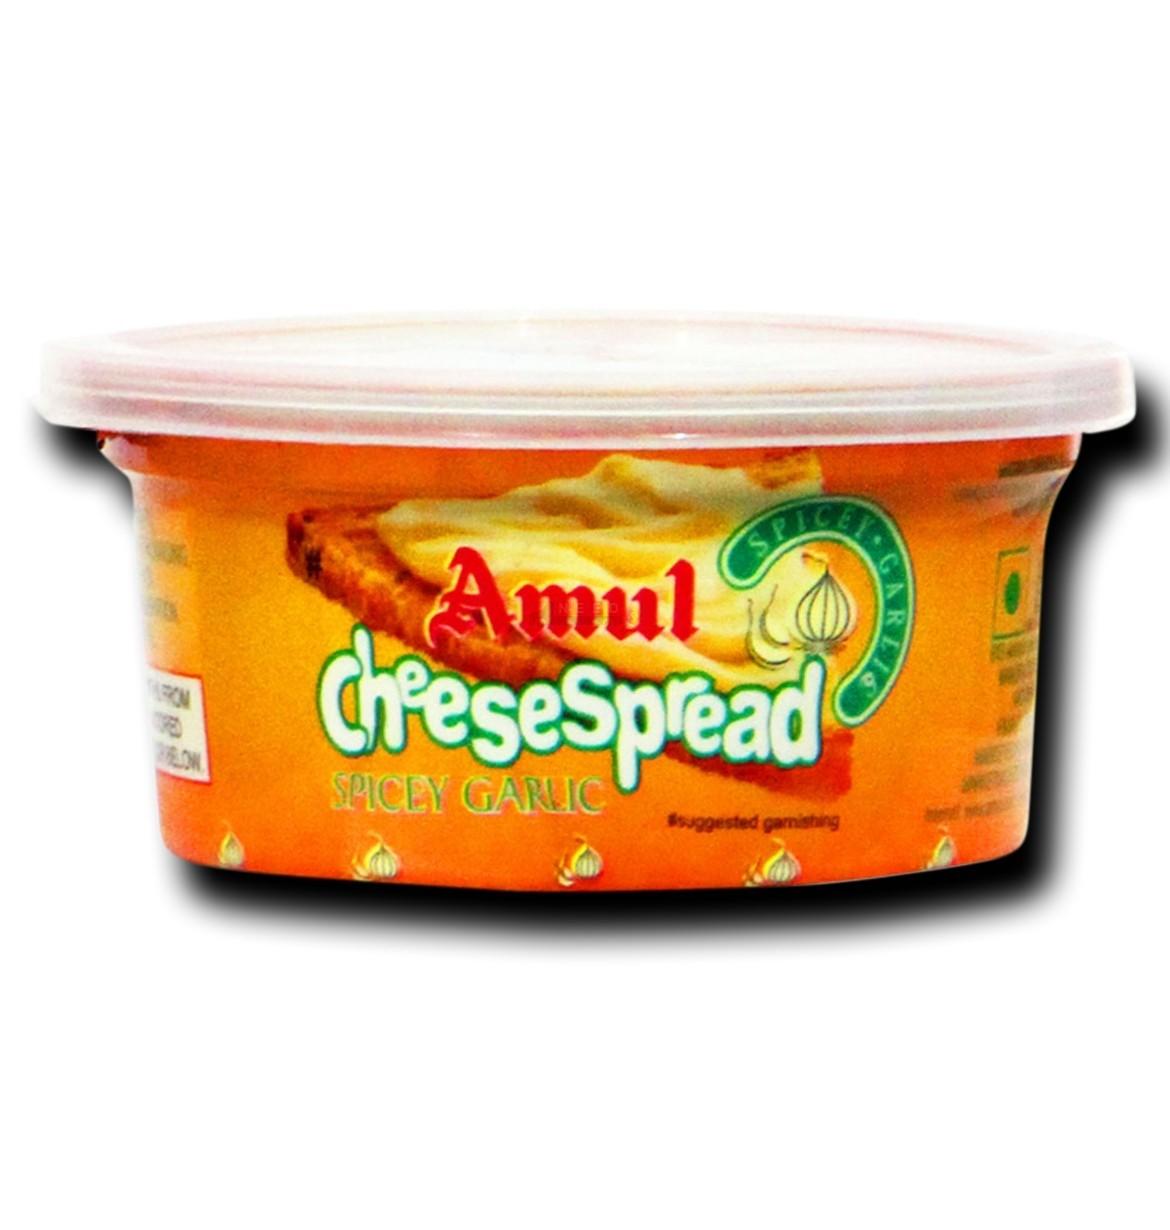 Amul Cheese Spread Spicy Garlic Image